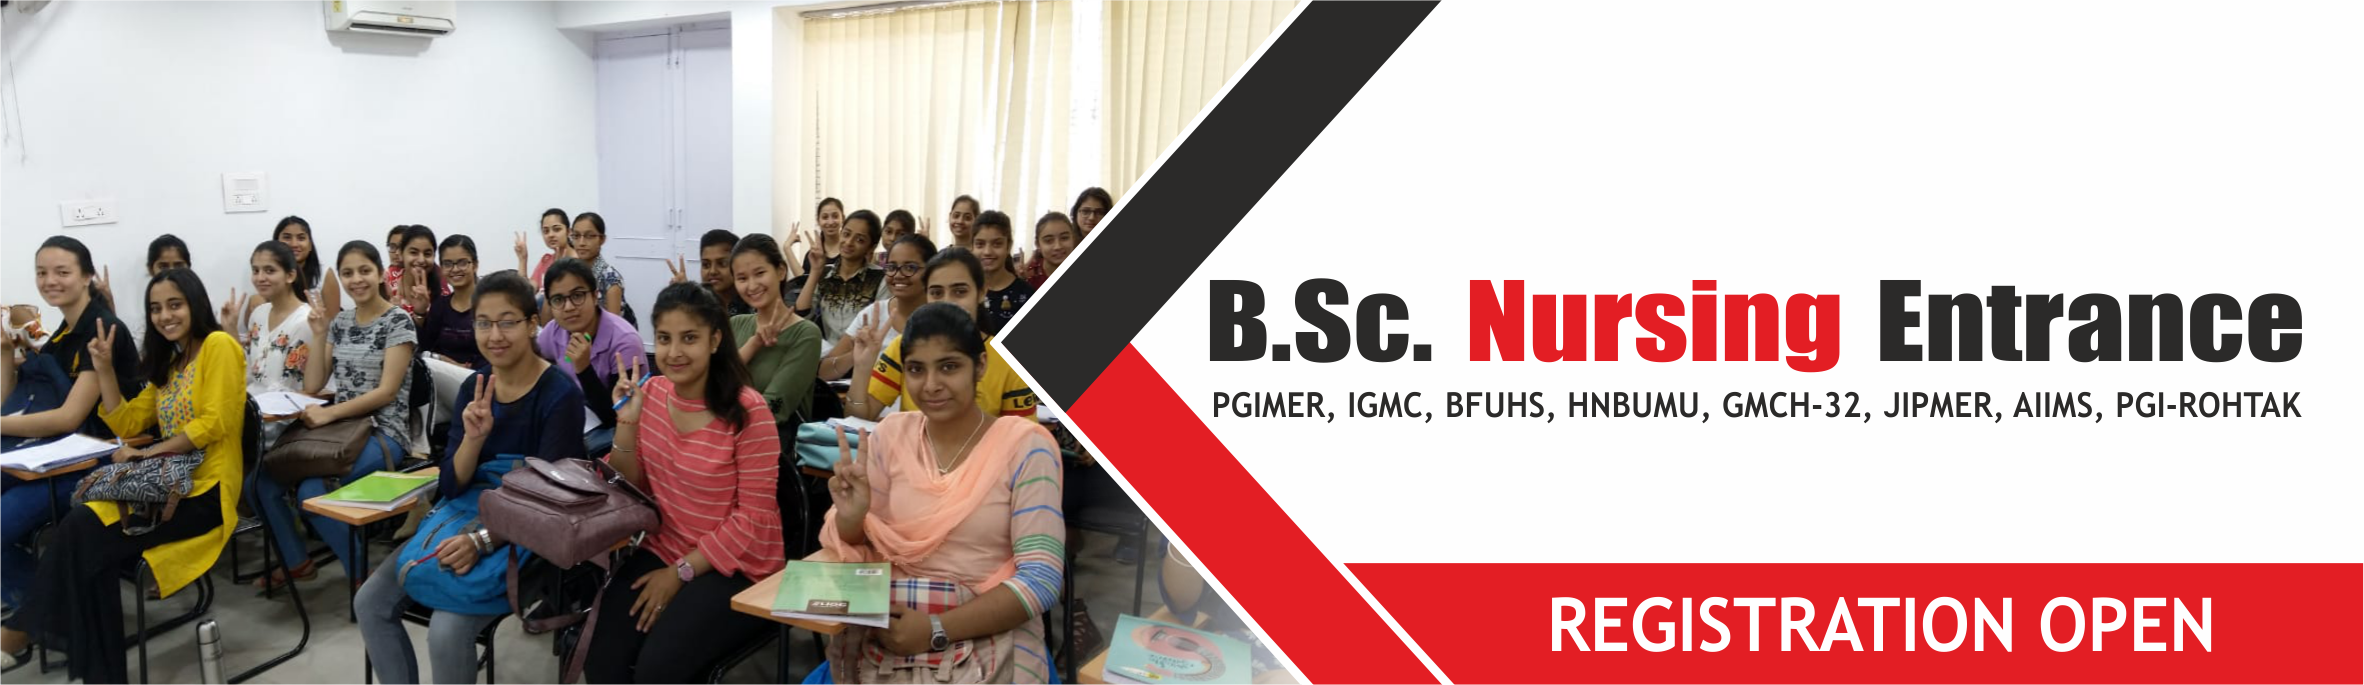 By Photo Congress || Pgi B sc Nursing 2019